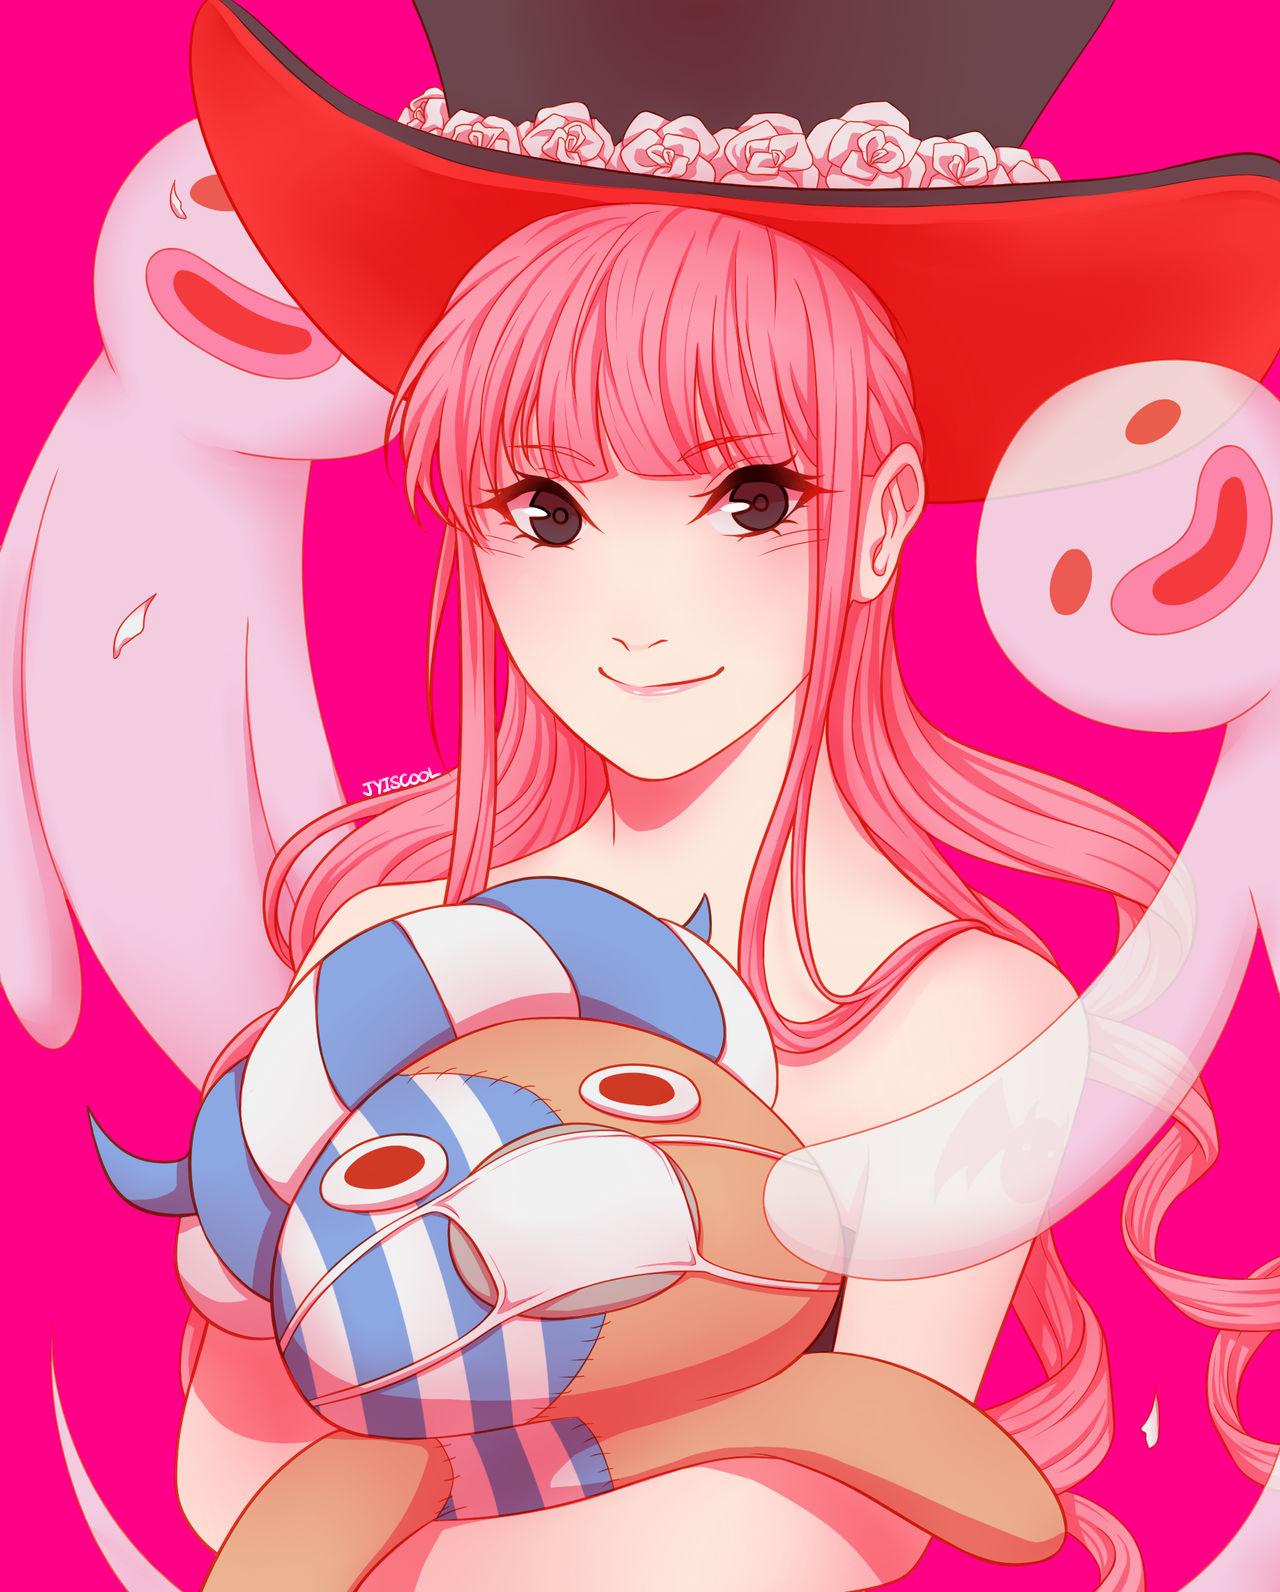 One Piece - Perona by Jyiscool on DeviantArt